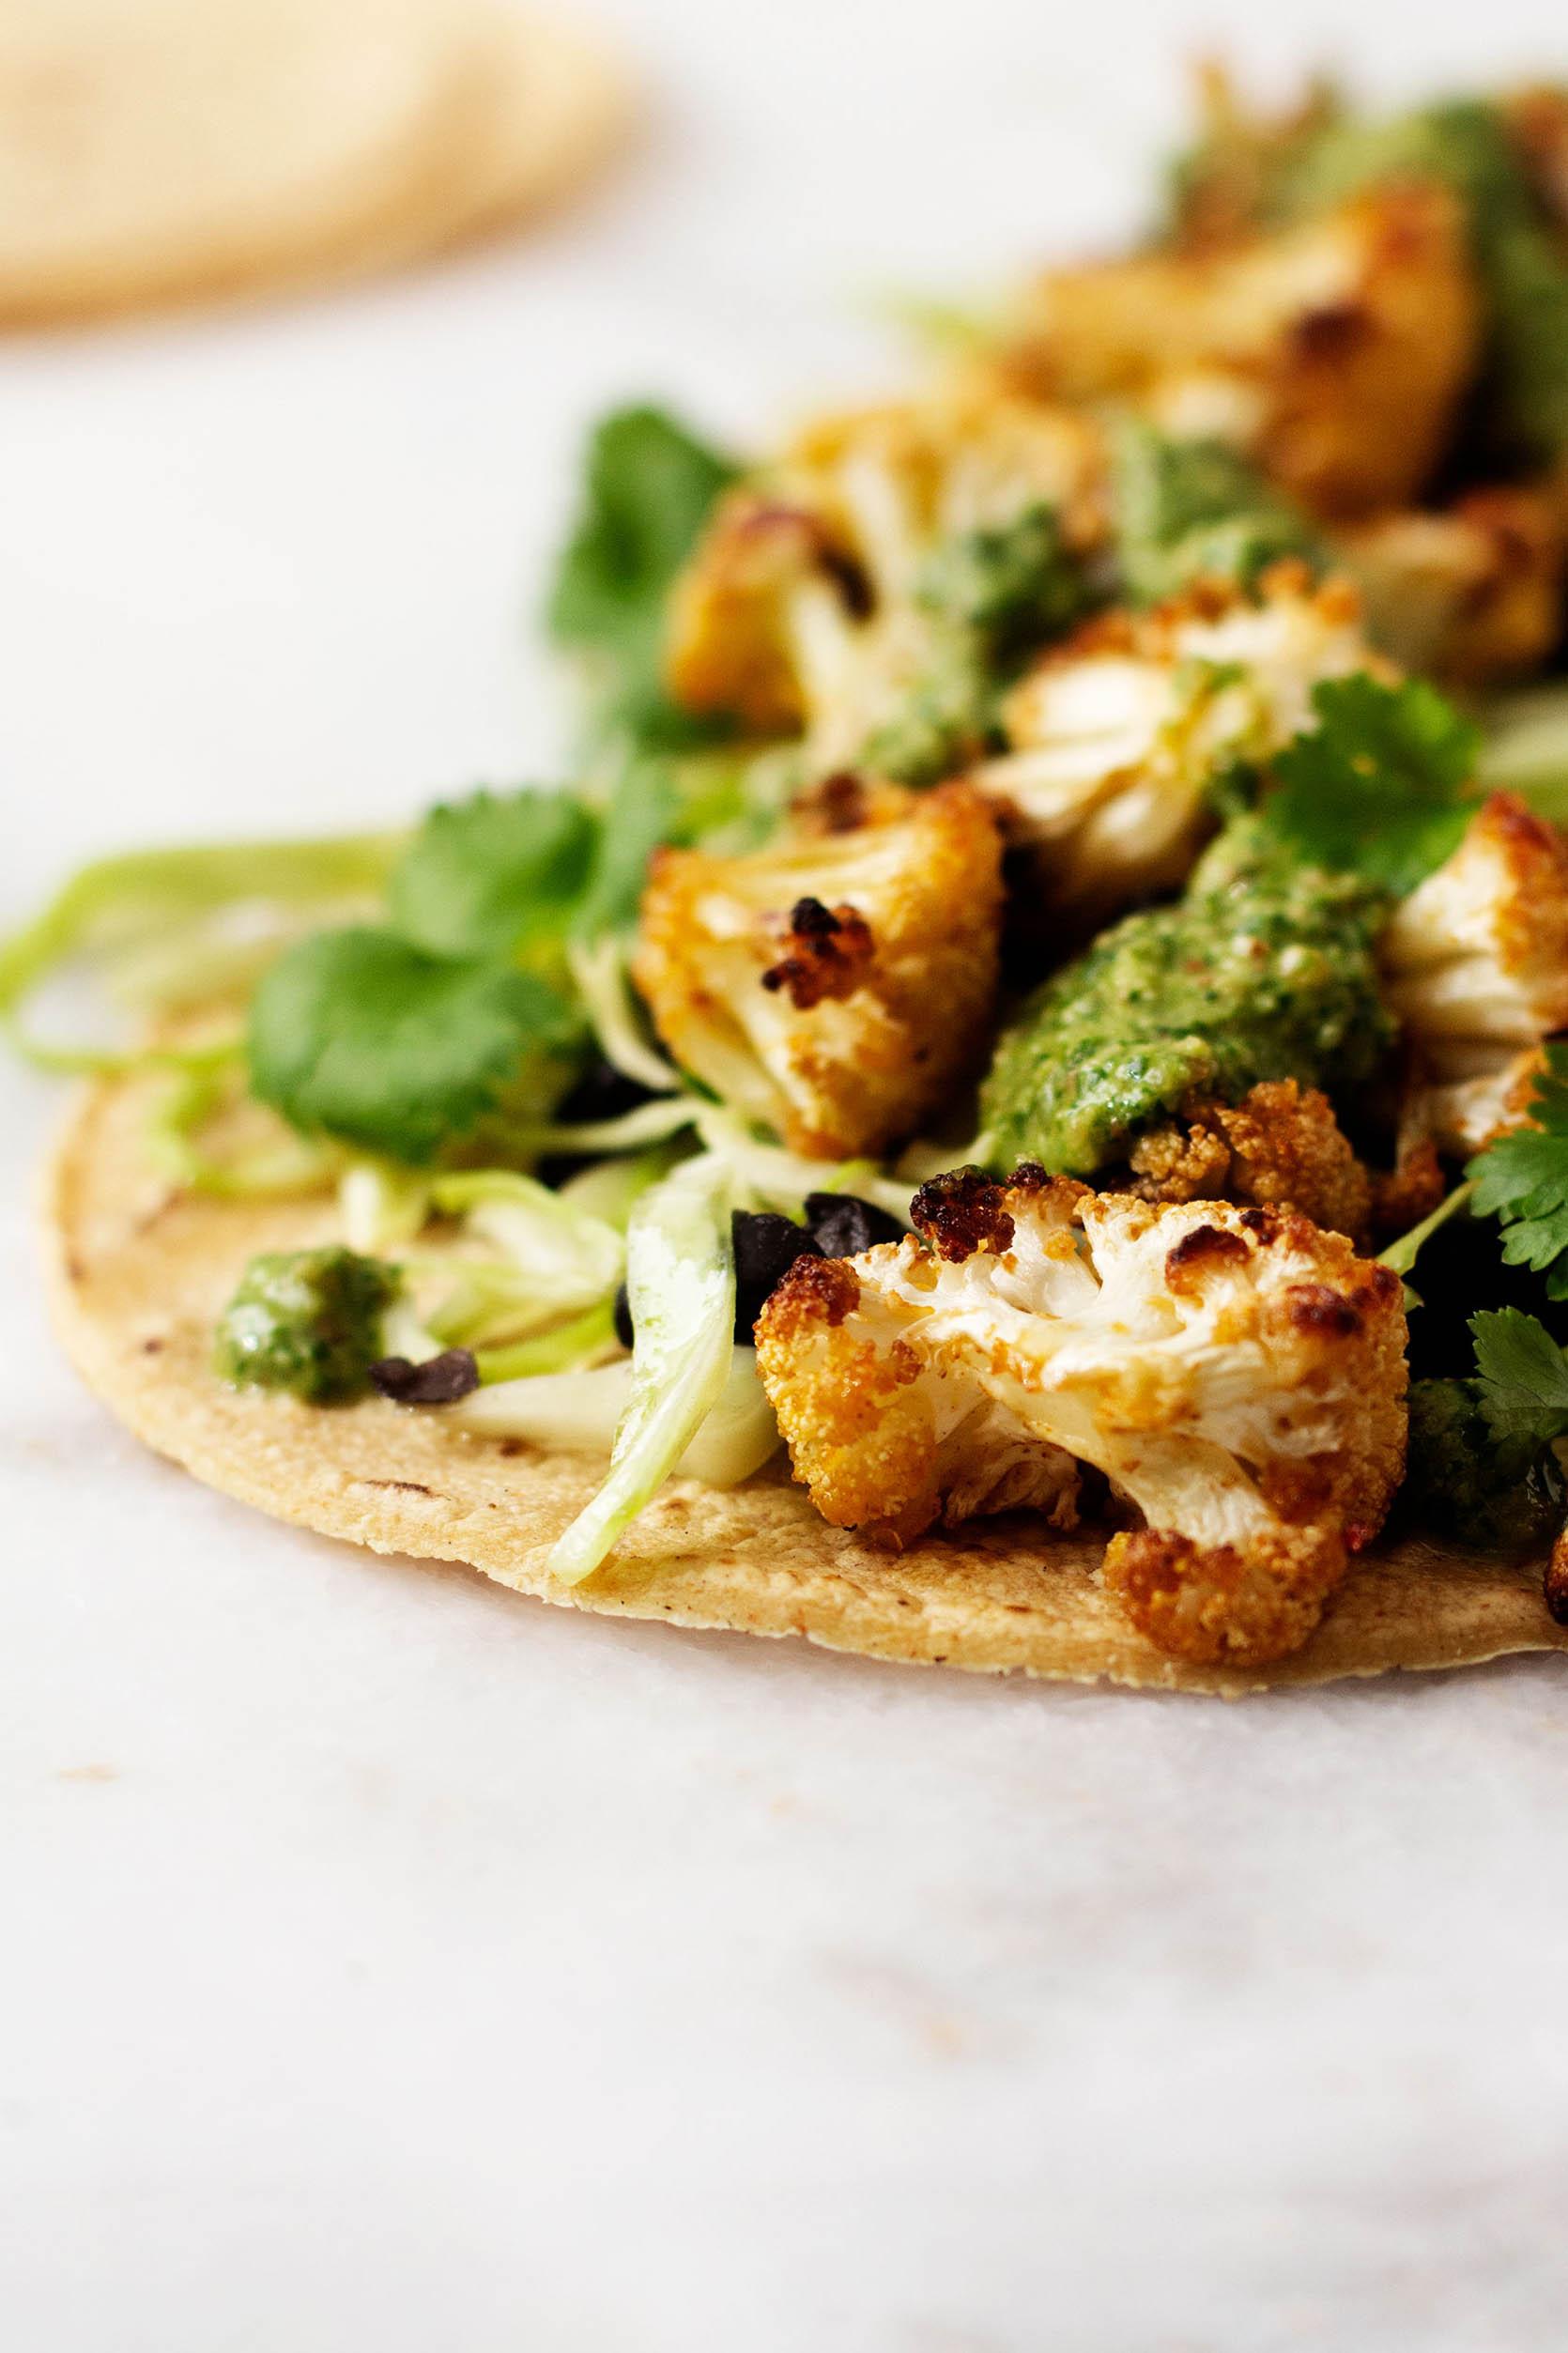 Crispy Cauliflower Chimichurri Tacos | The Full Helping